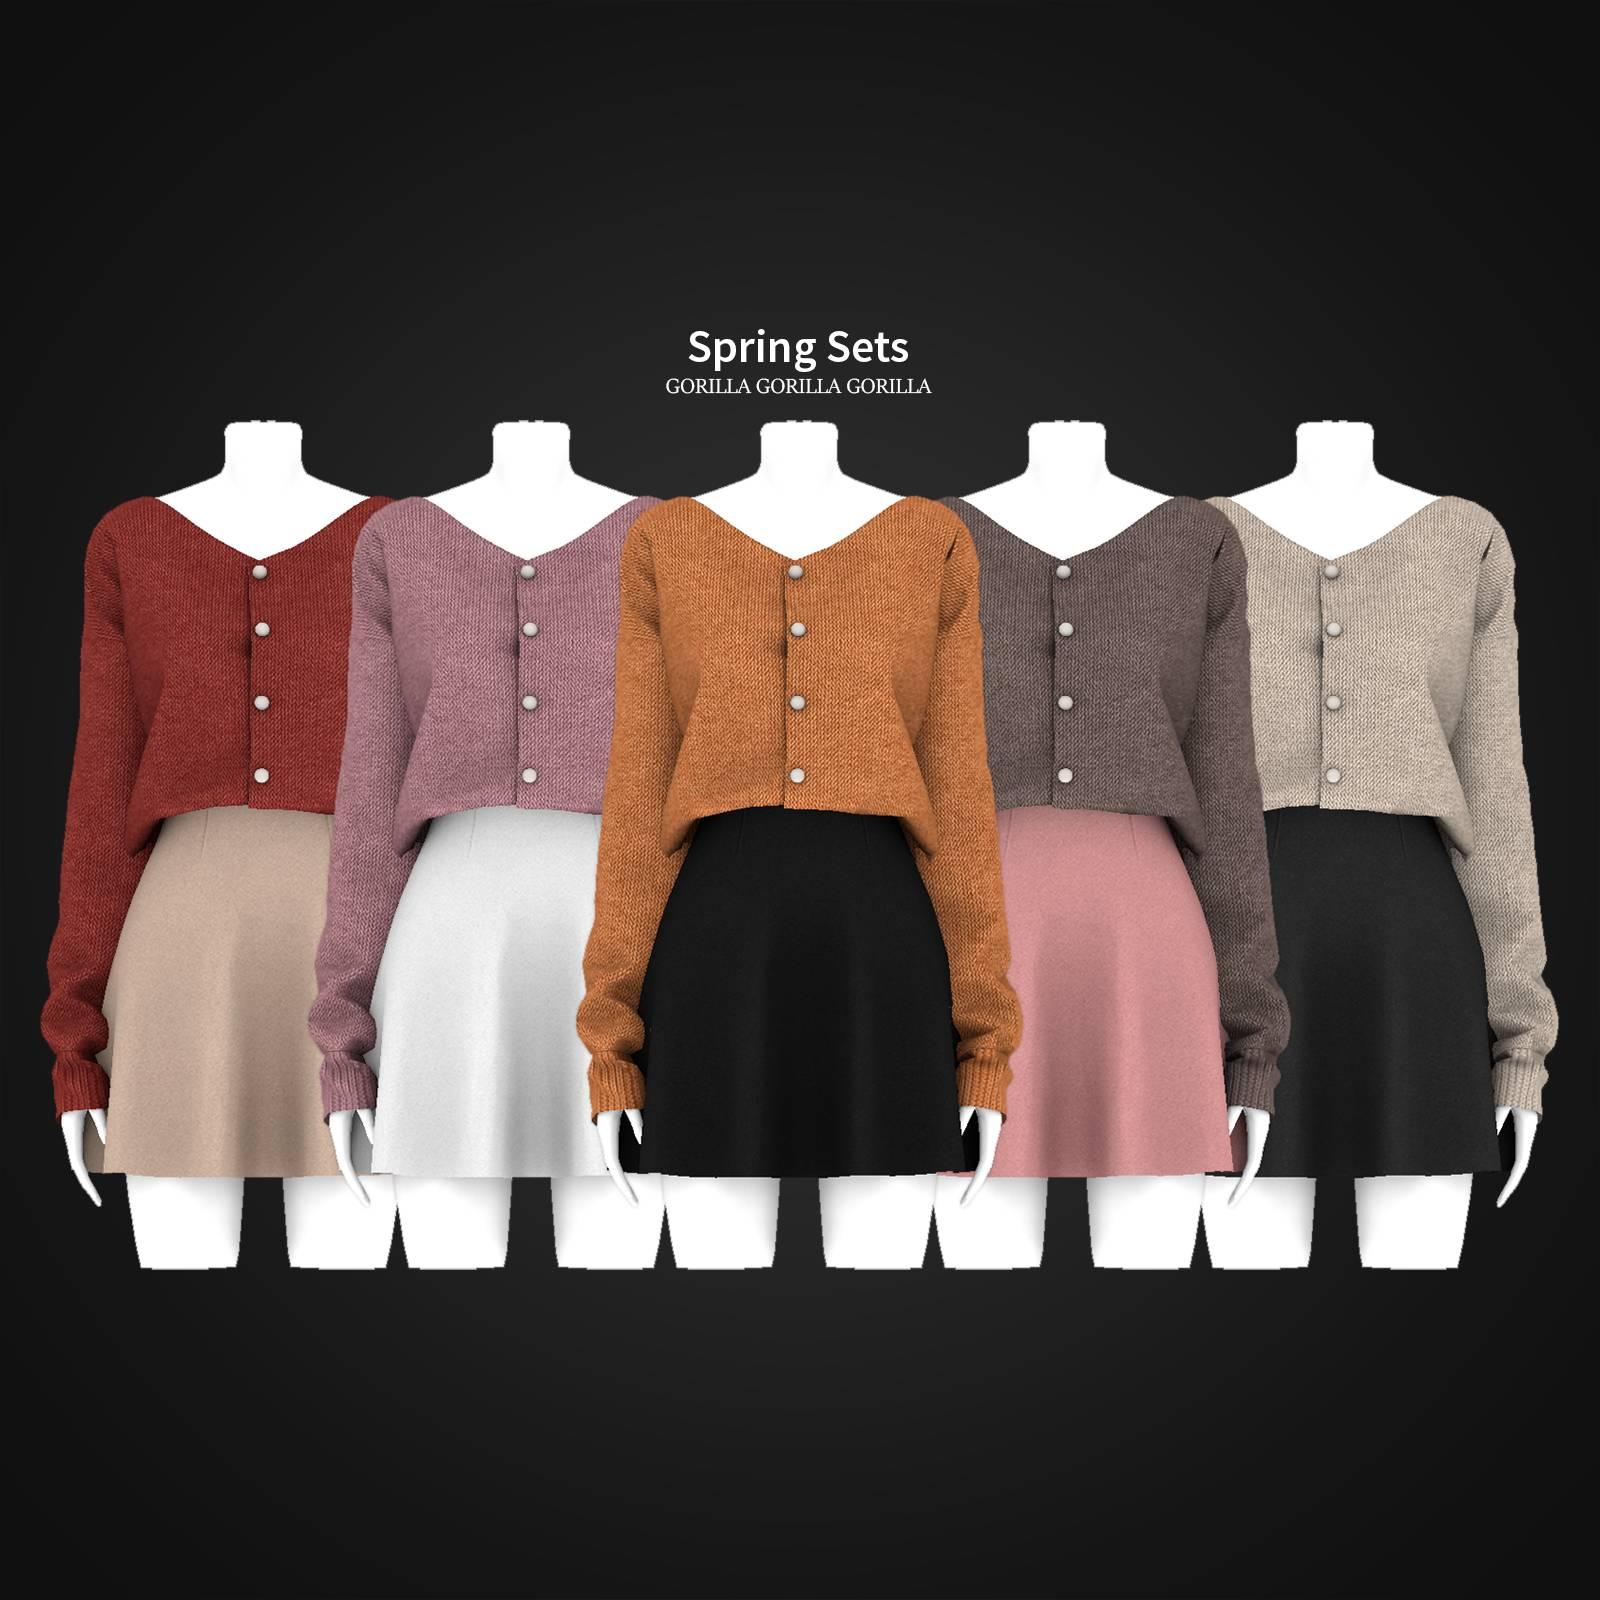 Кардиган и юбка - Spring Sets